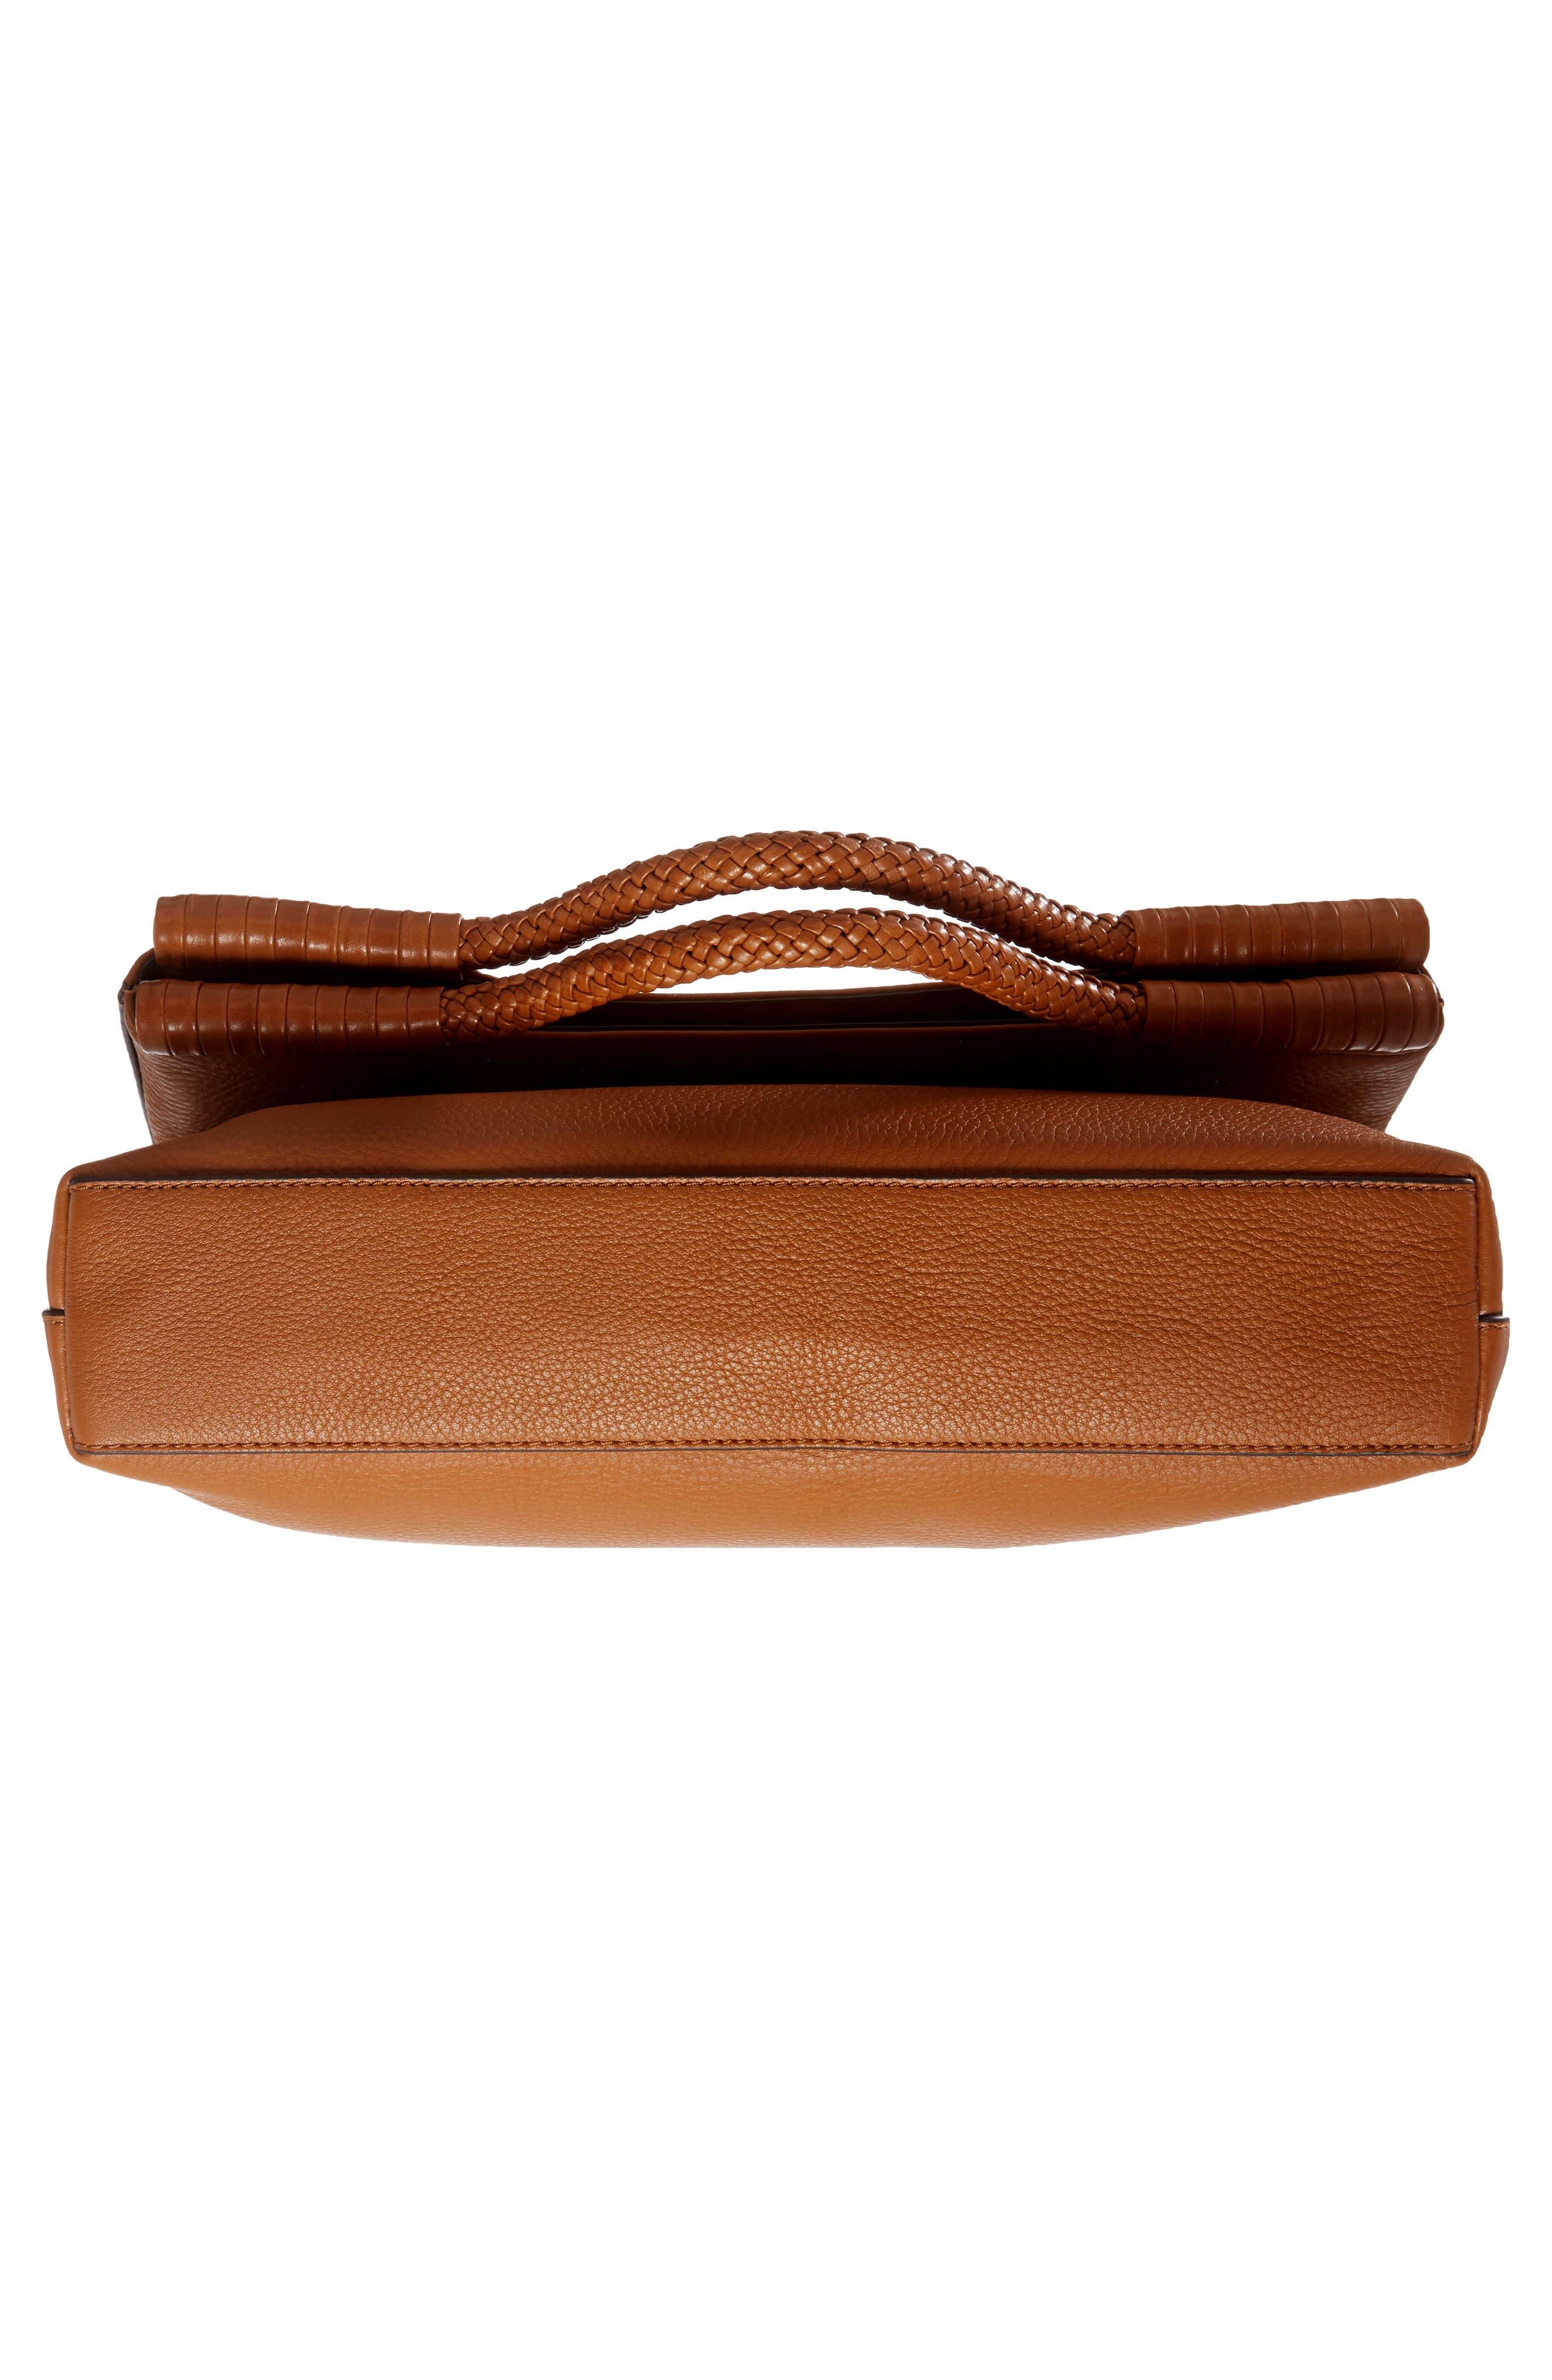 Convertible Leather Crossbody Bag,                             Alternate thumbnail 6, color,                             Saddle